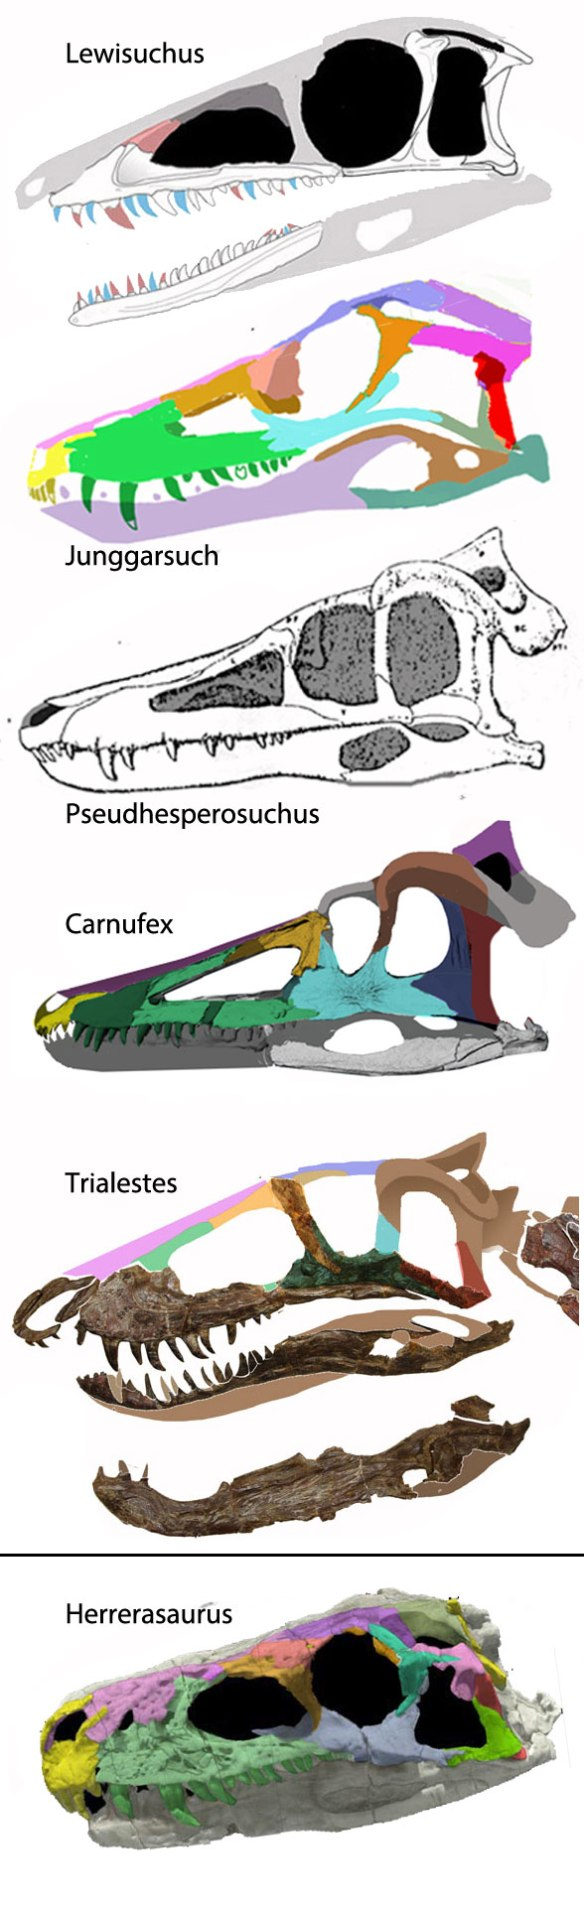 Figure 2. Skulls of the Junggarsuchus clade not to scale. Herrerasaurus is the basalmost dinosaur.